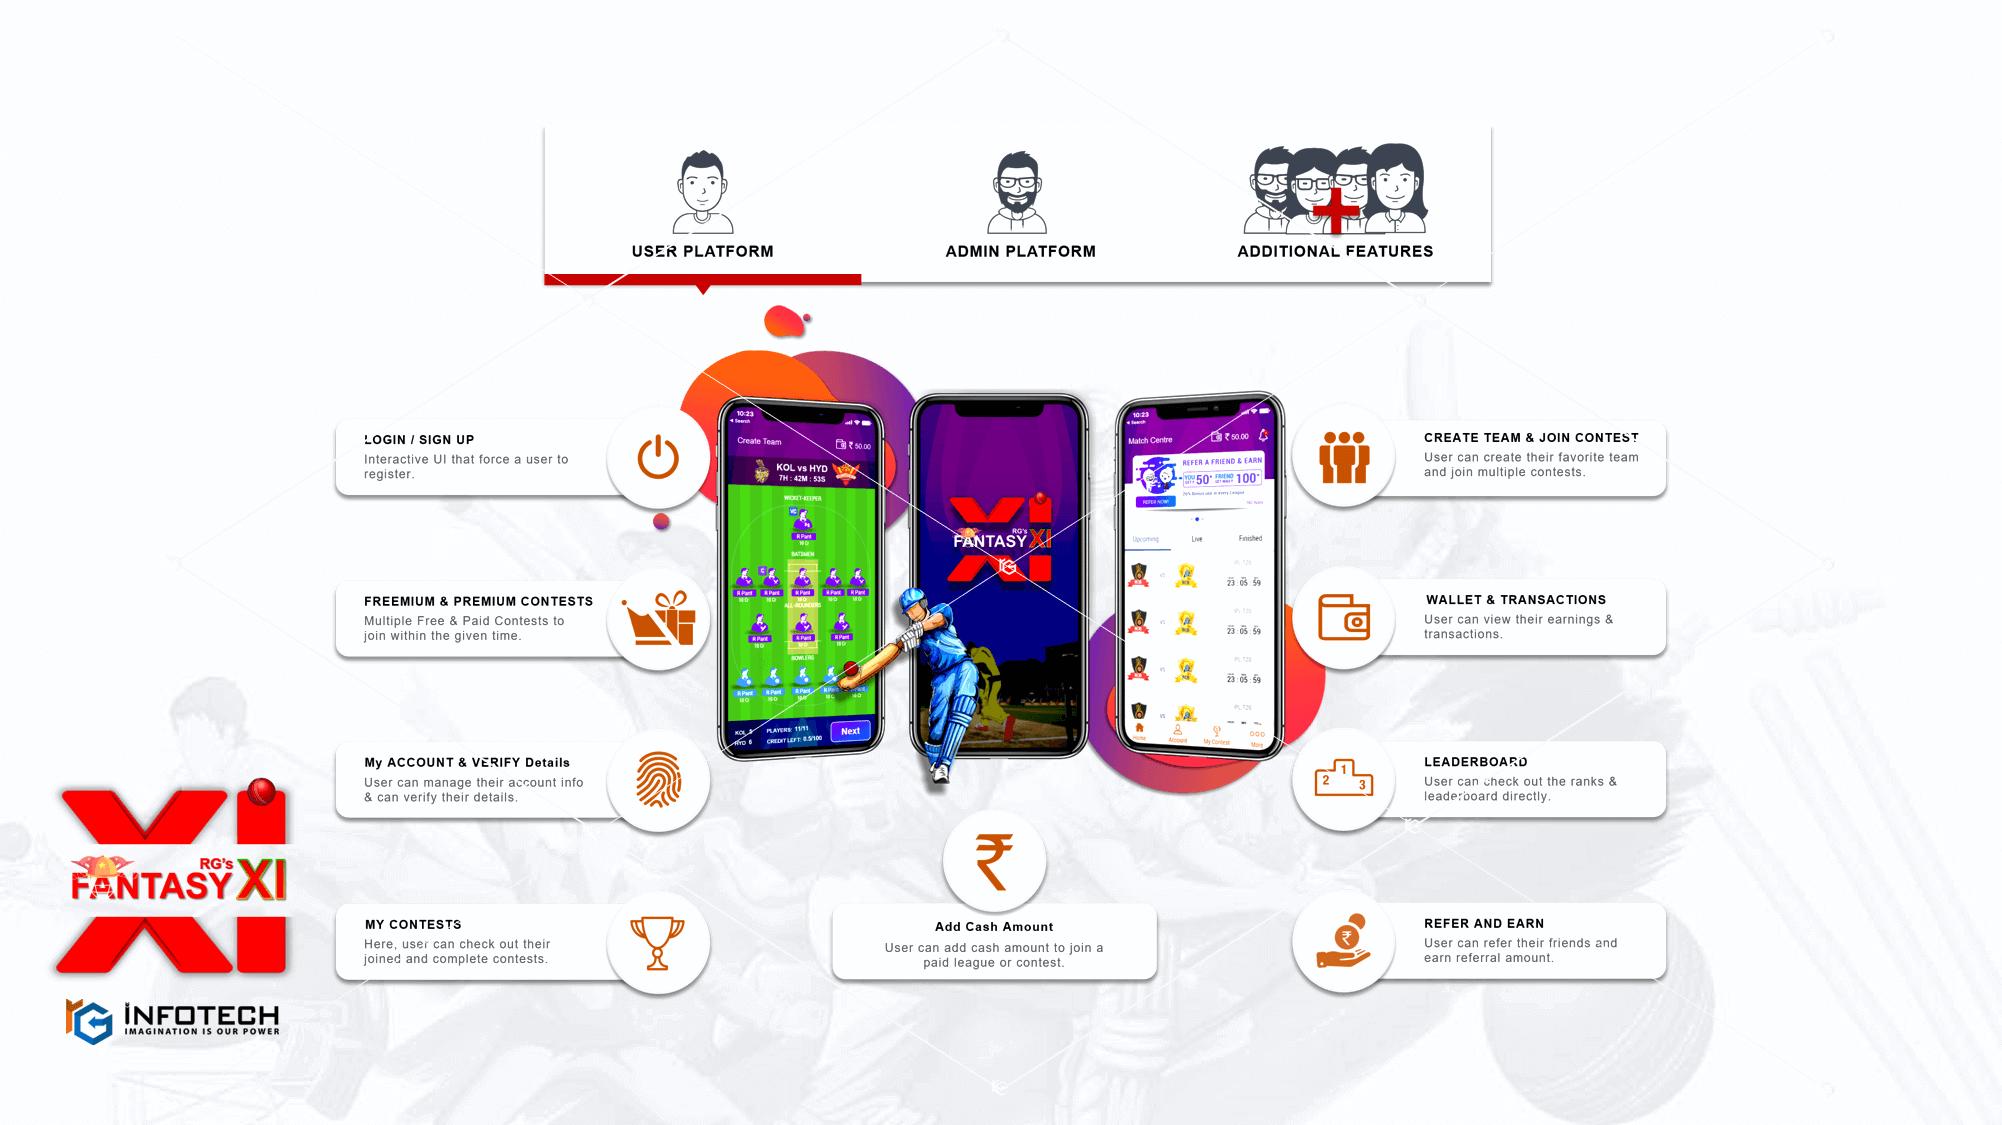 Fantasy App User-Features